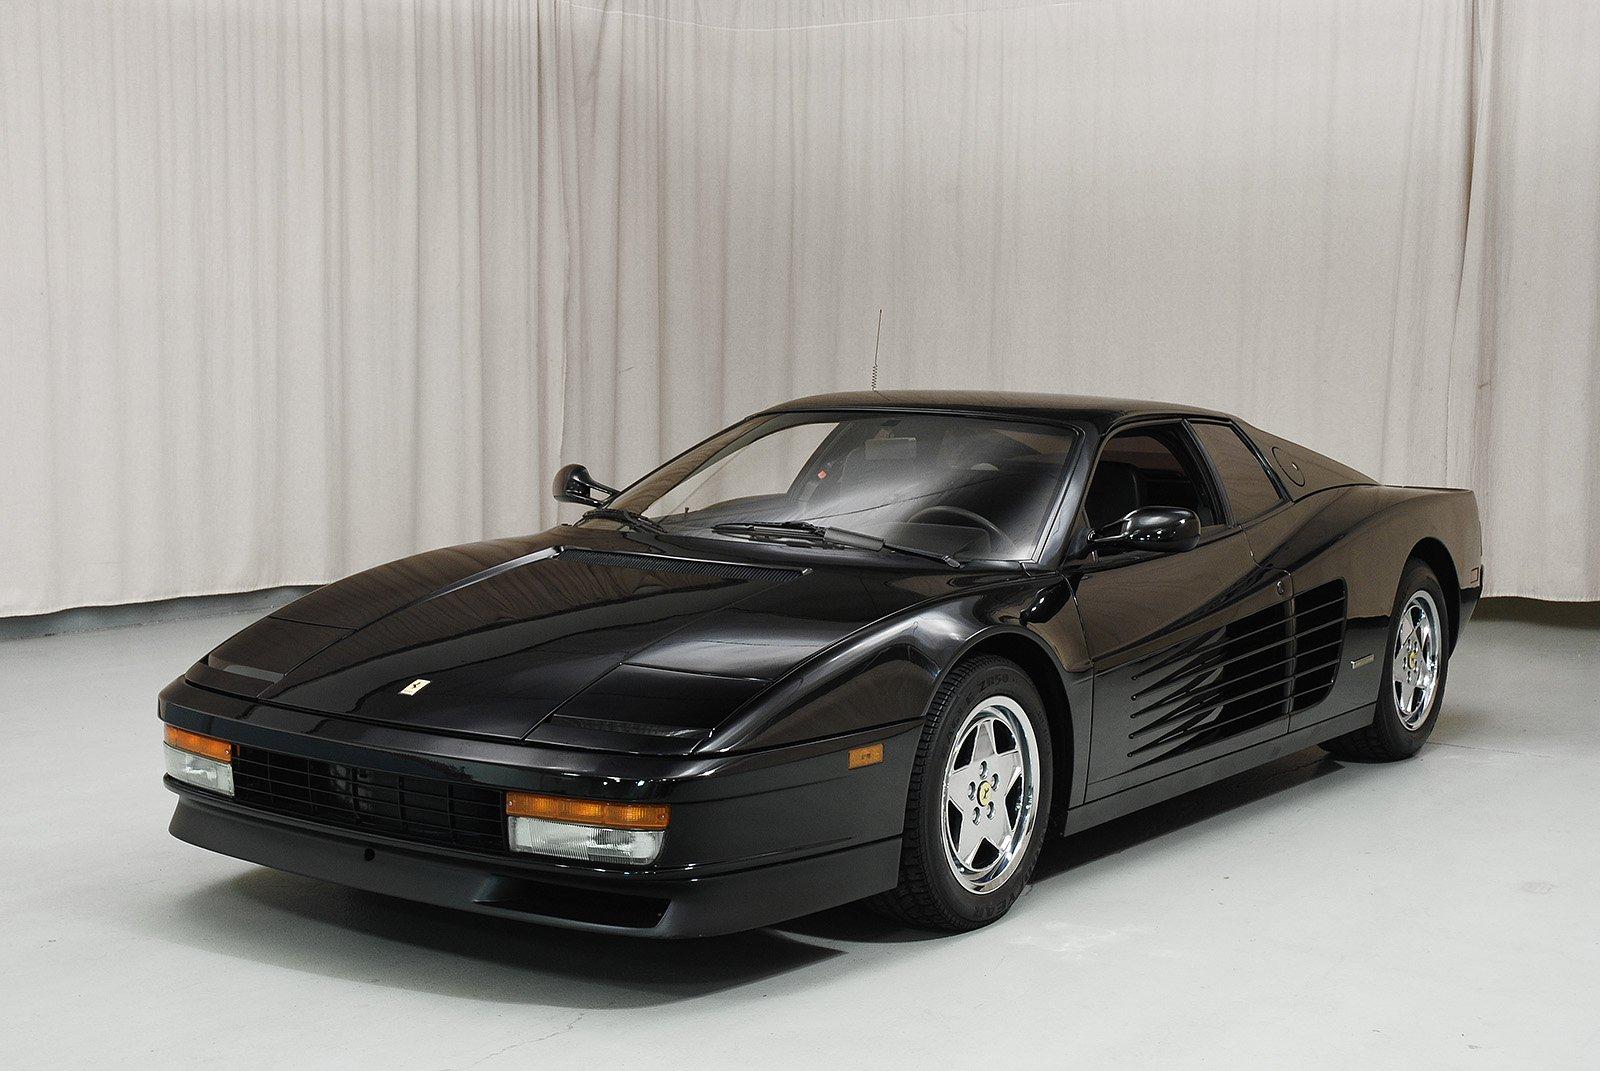 1989 Ferrari Testarossa Coupe Sold by Hyman LTD